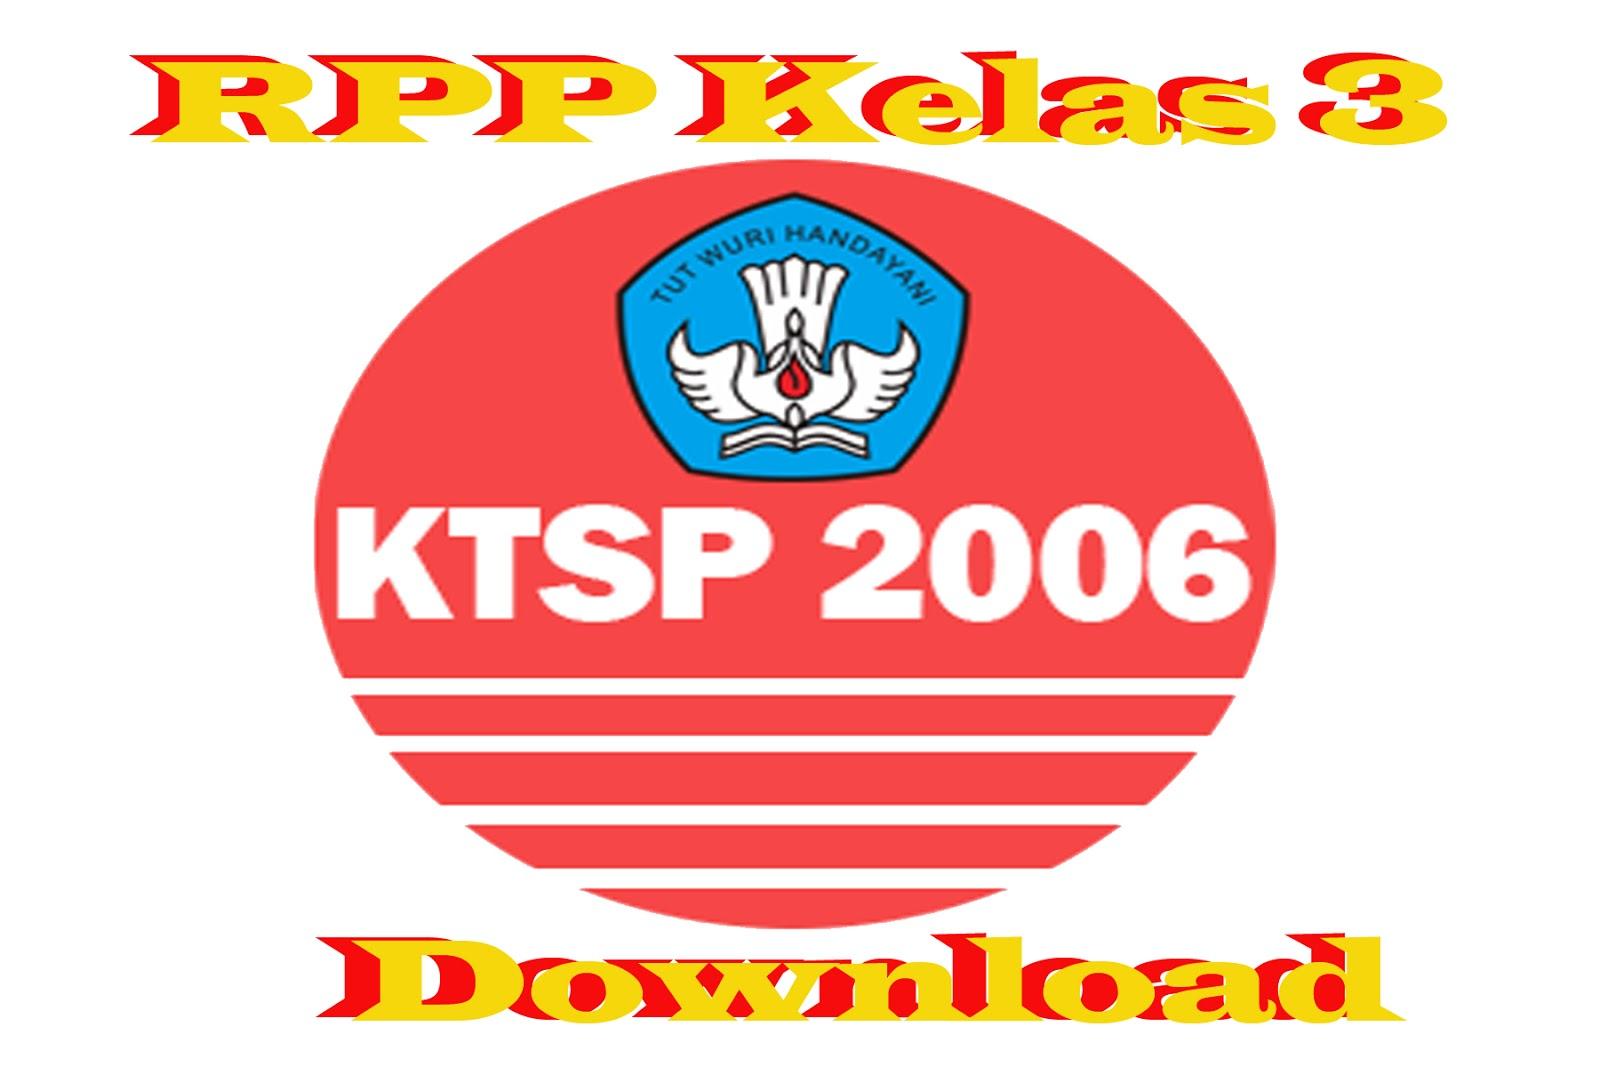 Download Rpp Silabus Kd Ki Promes Prota Kelas 3 Ktsp File Sekolah Kita File Sekolah Kita